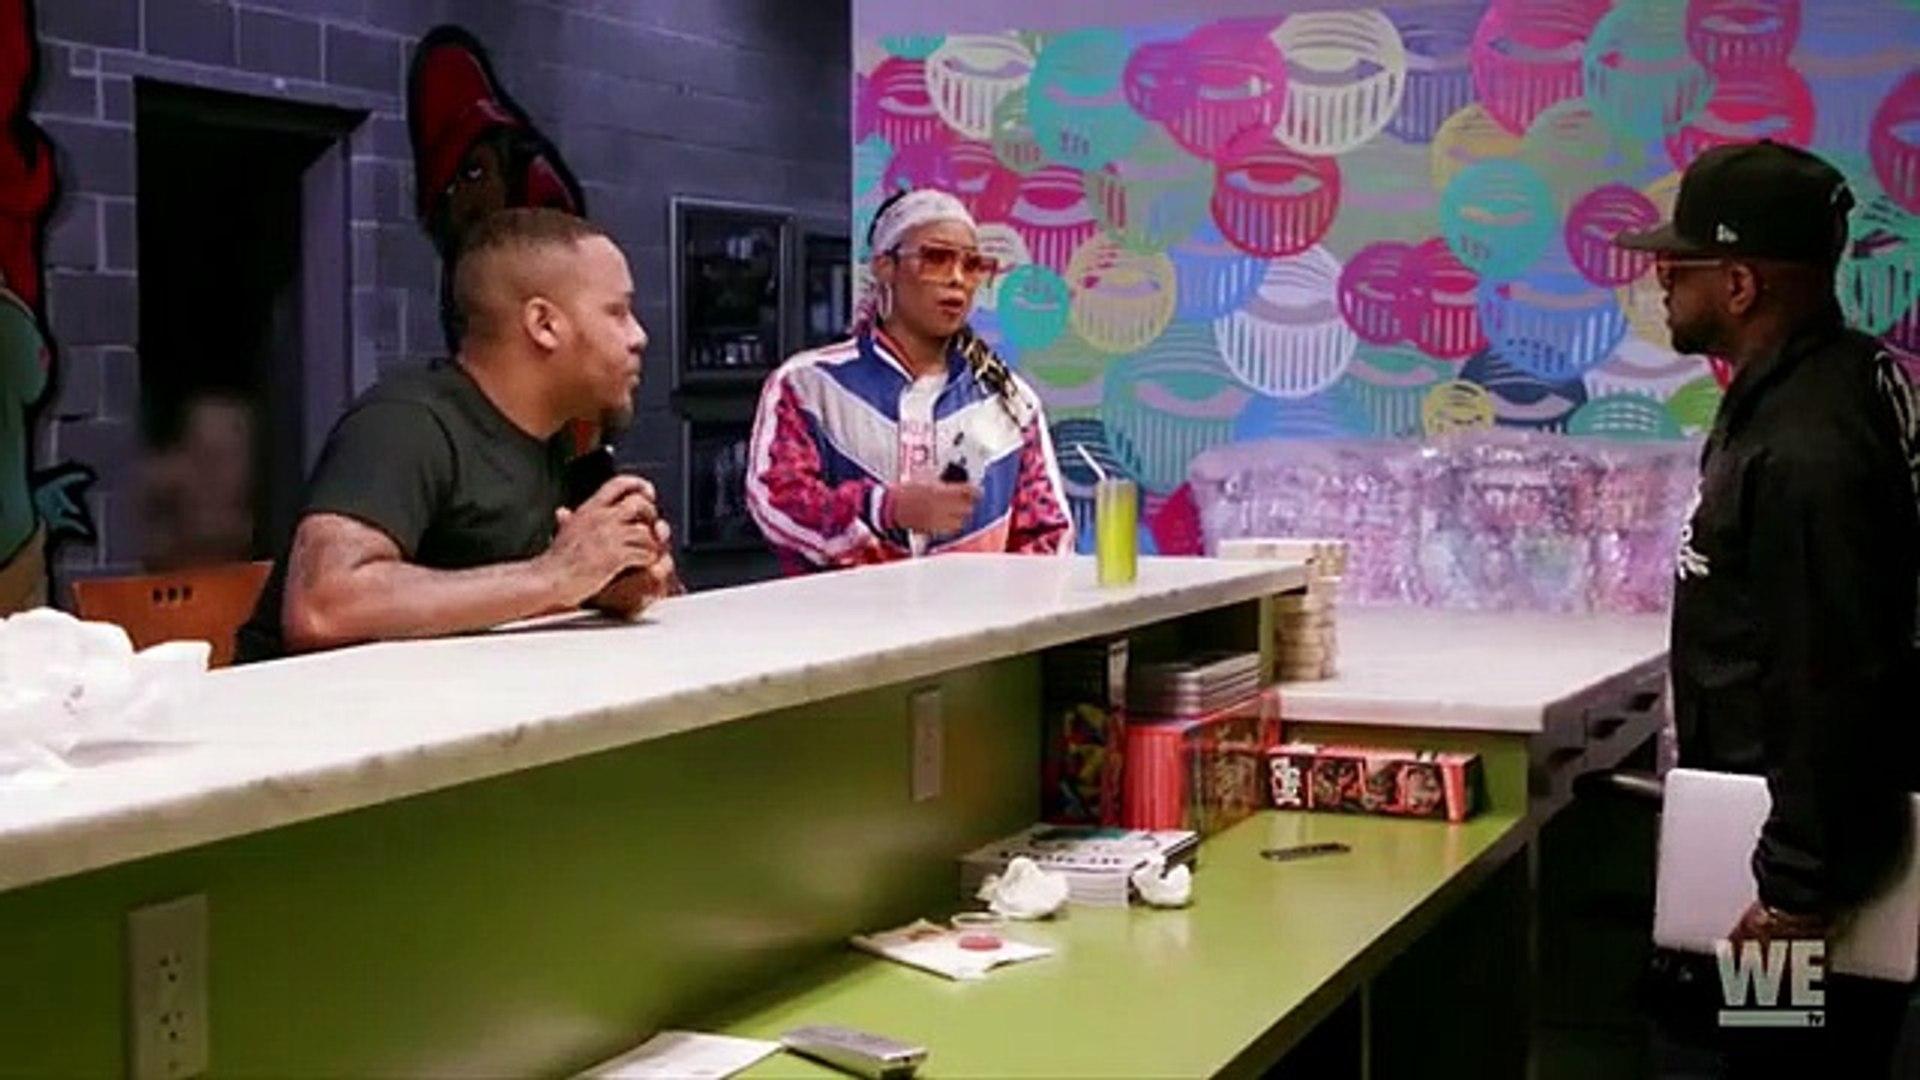 Love & Hip Hop Atlanta - S08E18 - Winner Take All - July 15, 2019 || Love & Hip Hop Atlanta